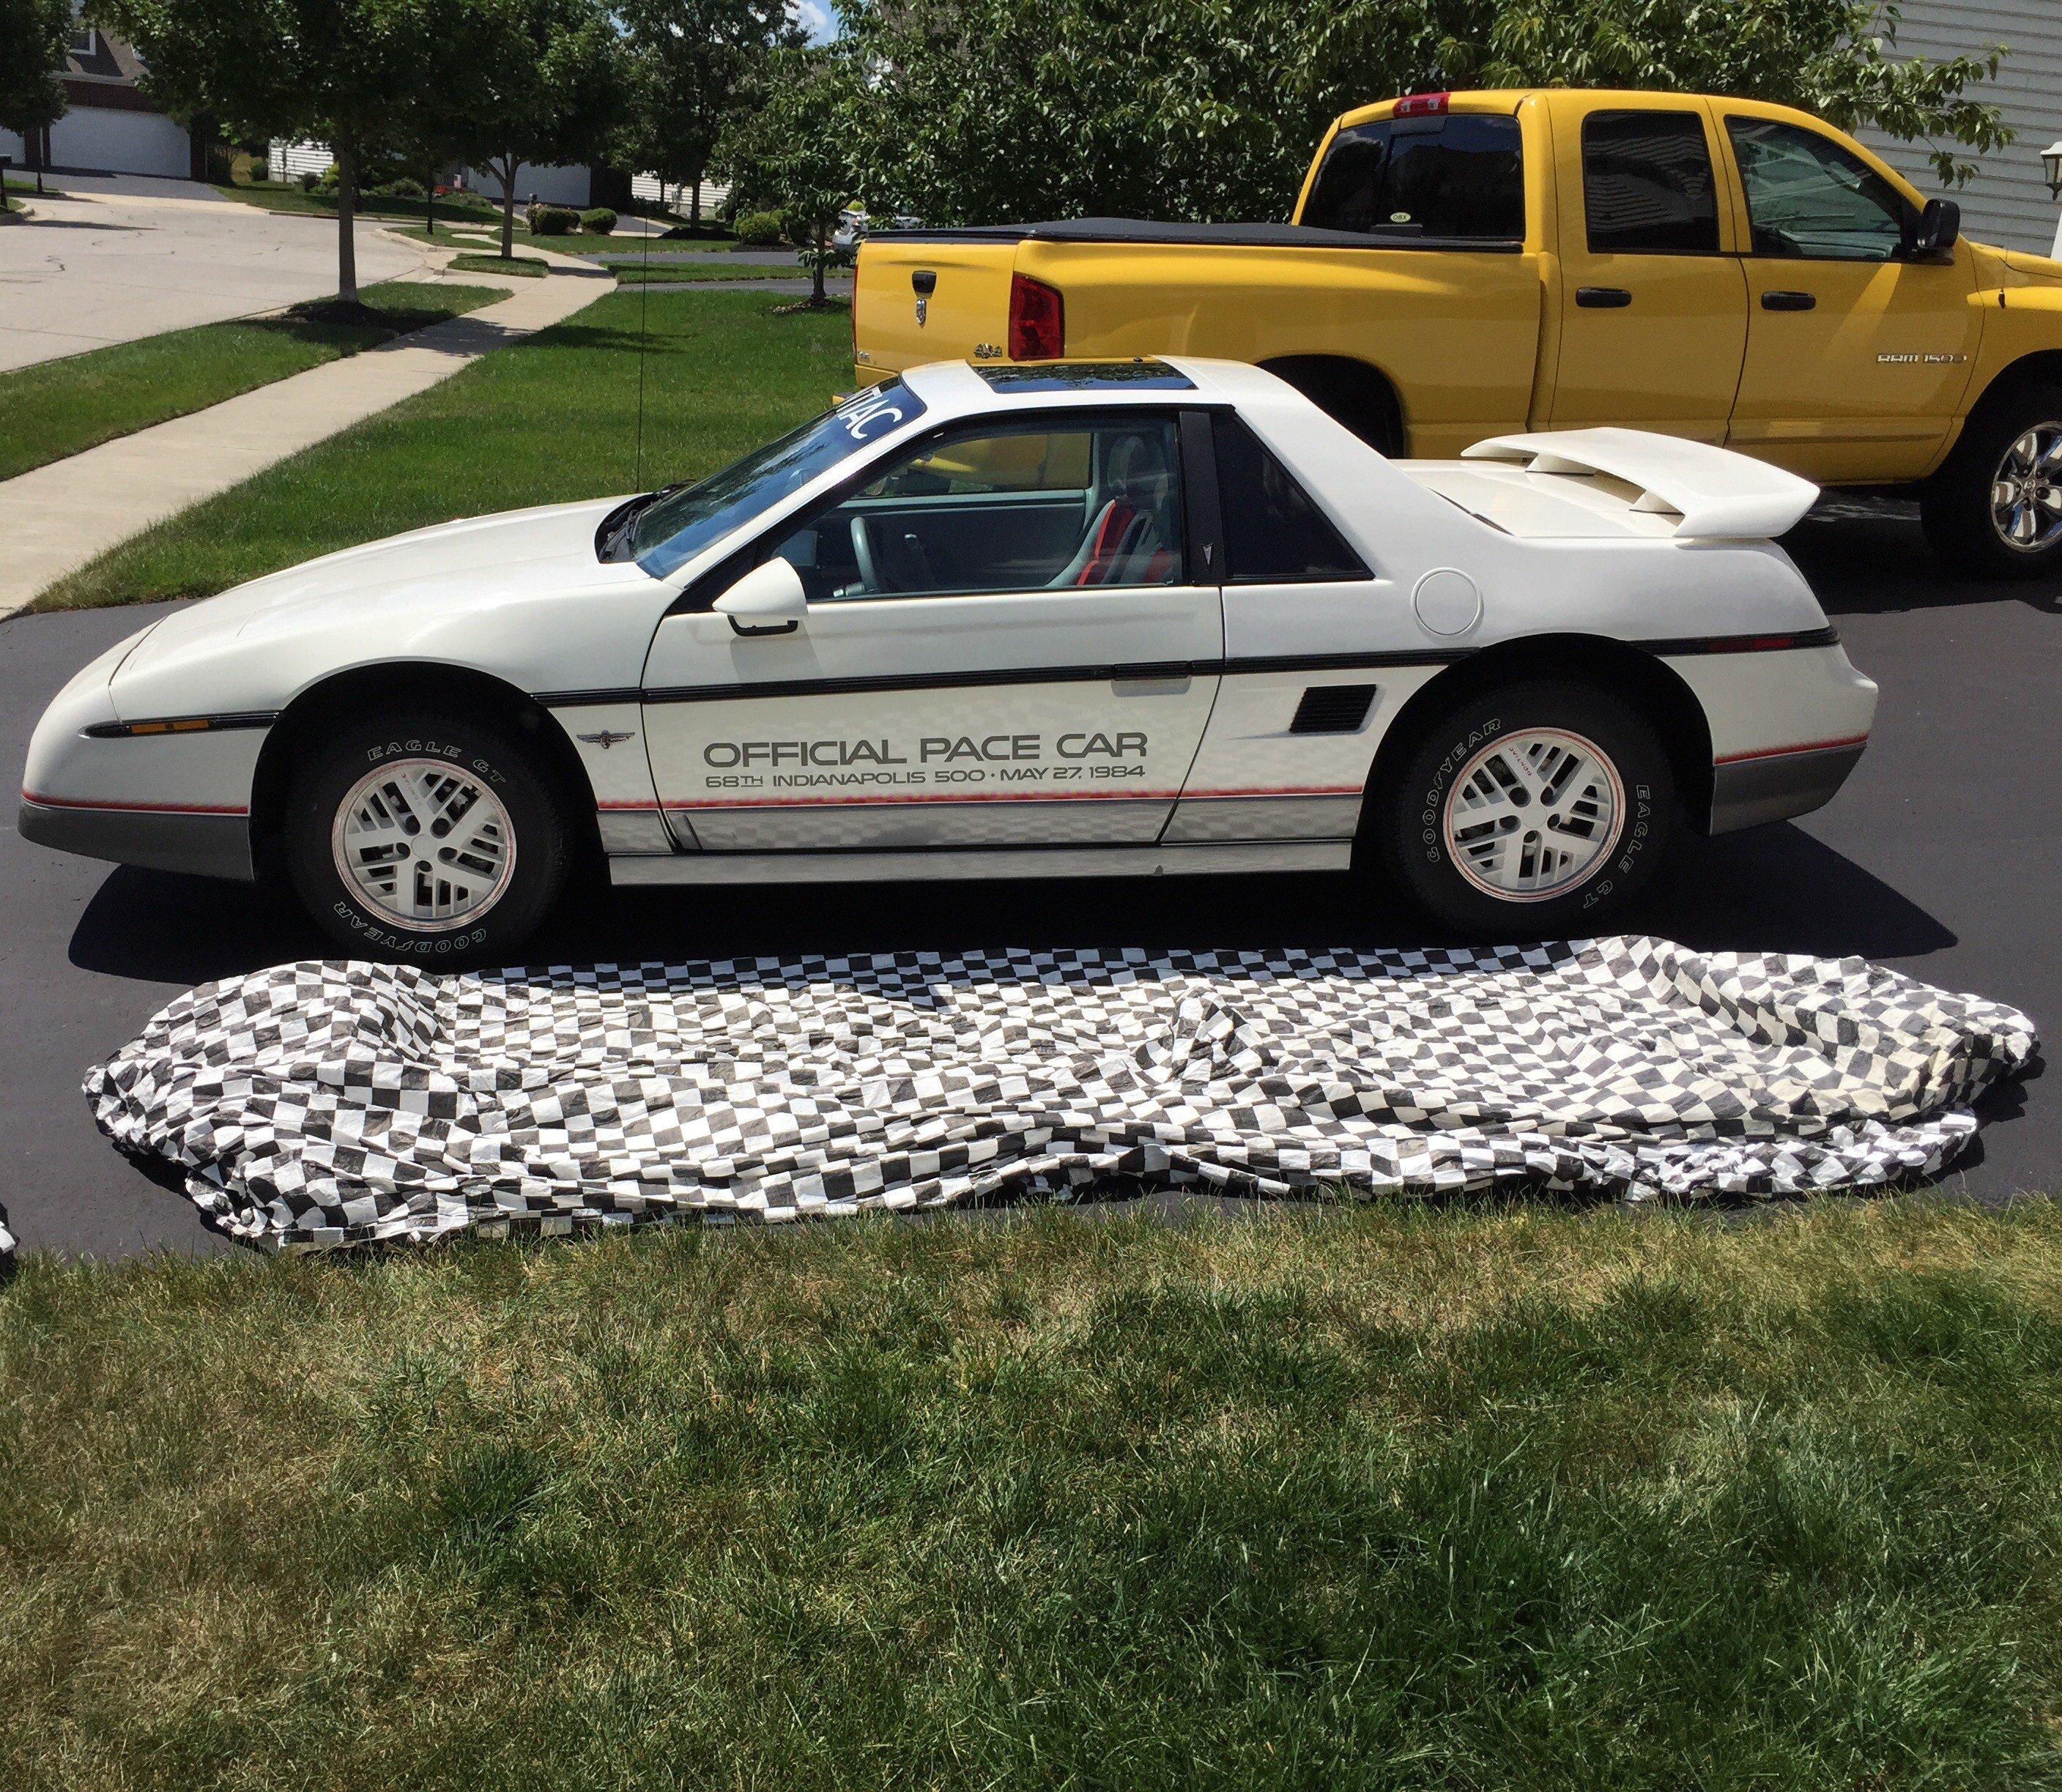 Pontiac Fiero Classics for Sale - Classics on Autotrader